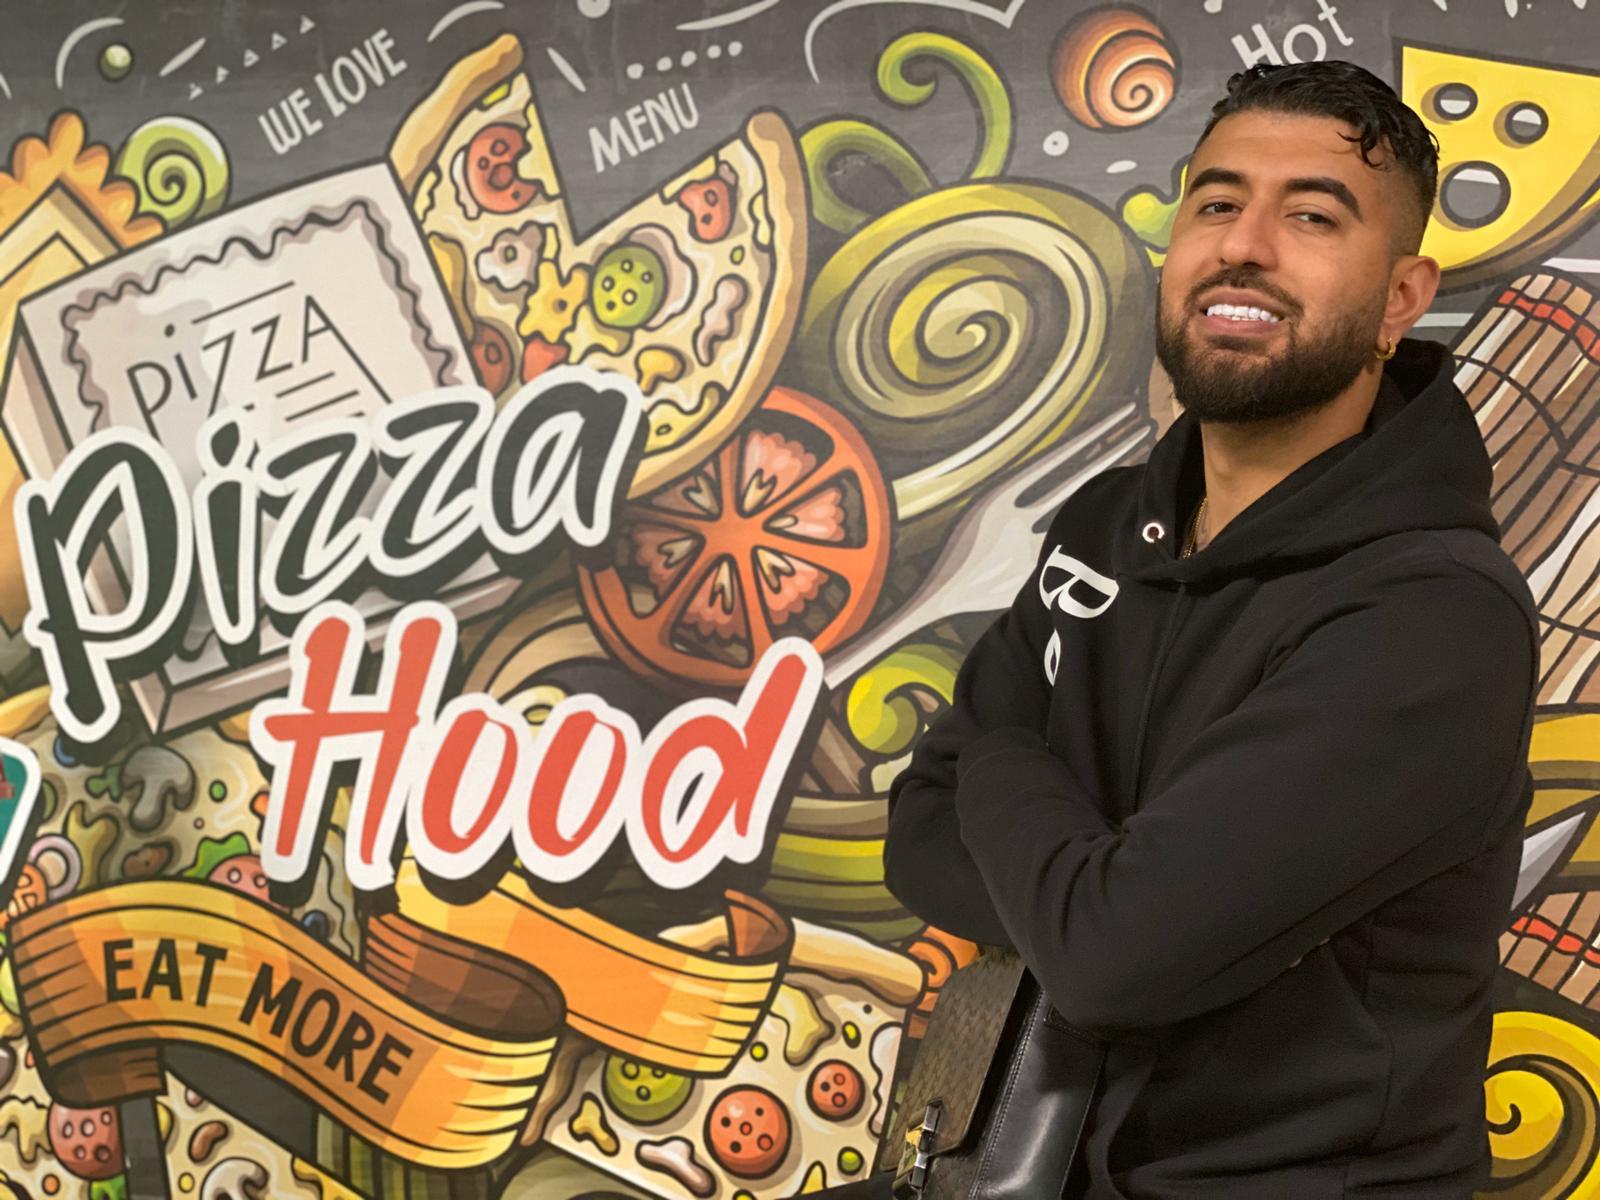 Pizzahood